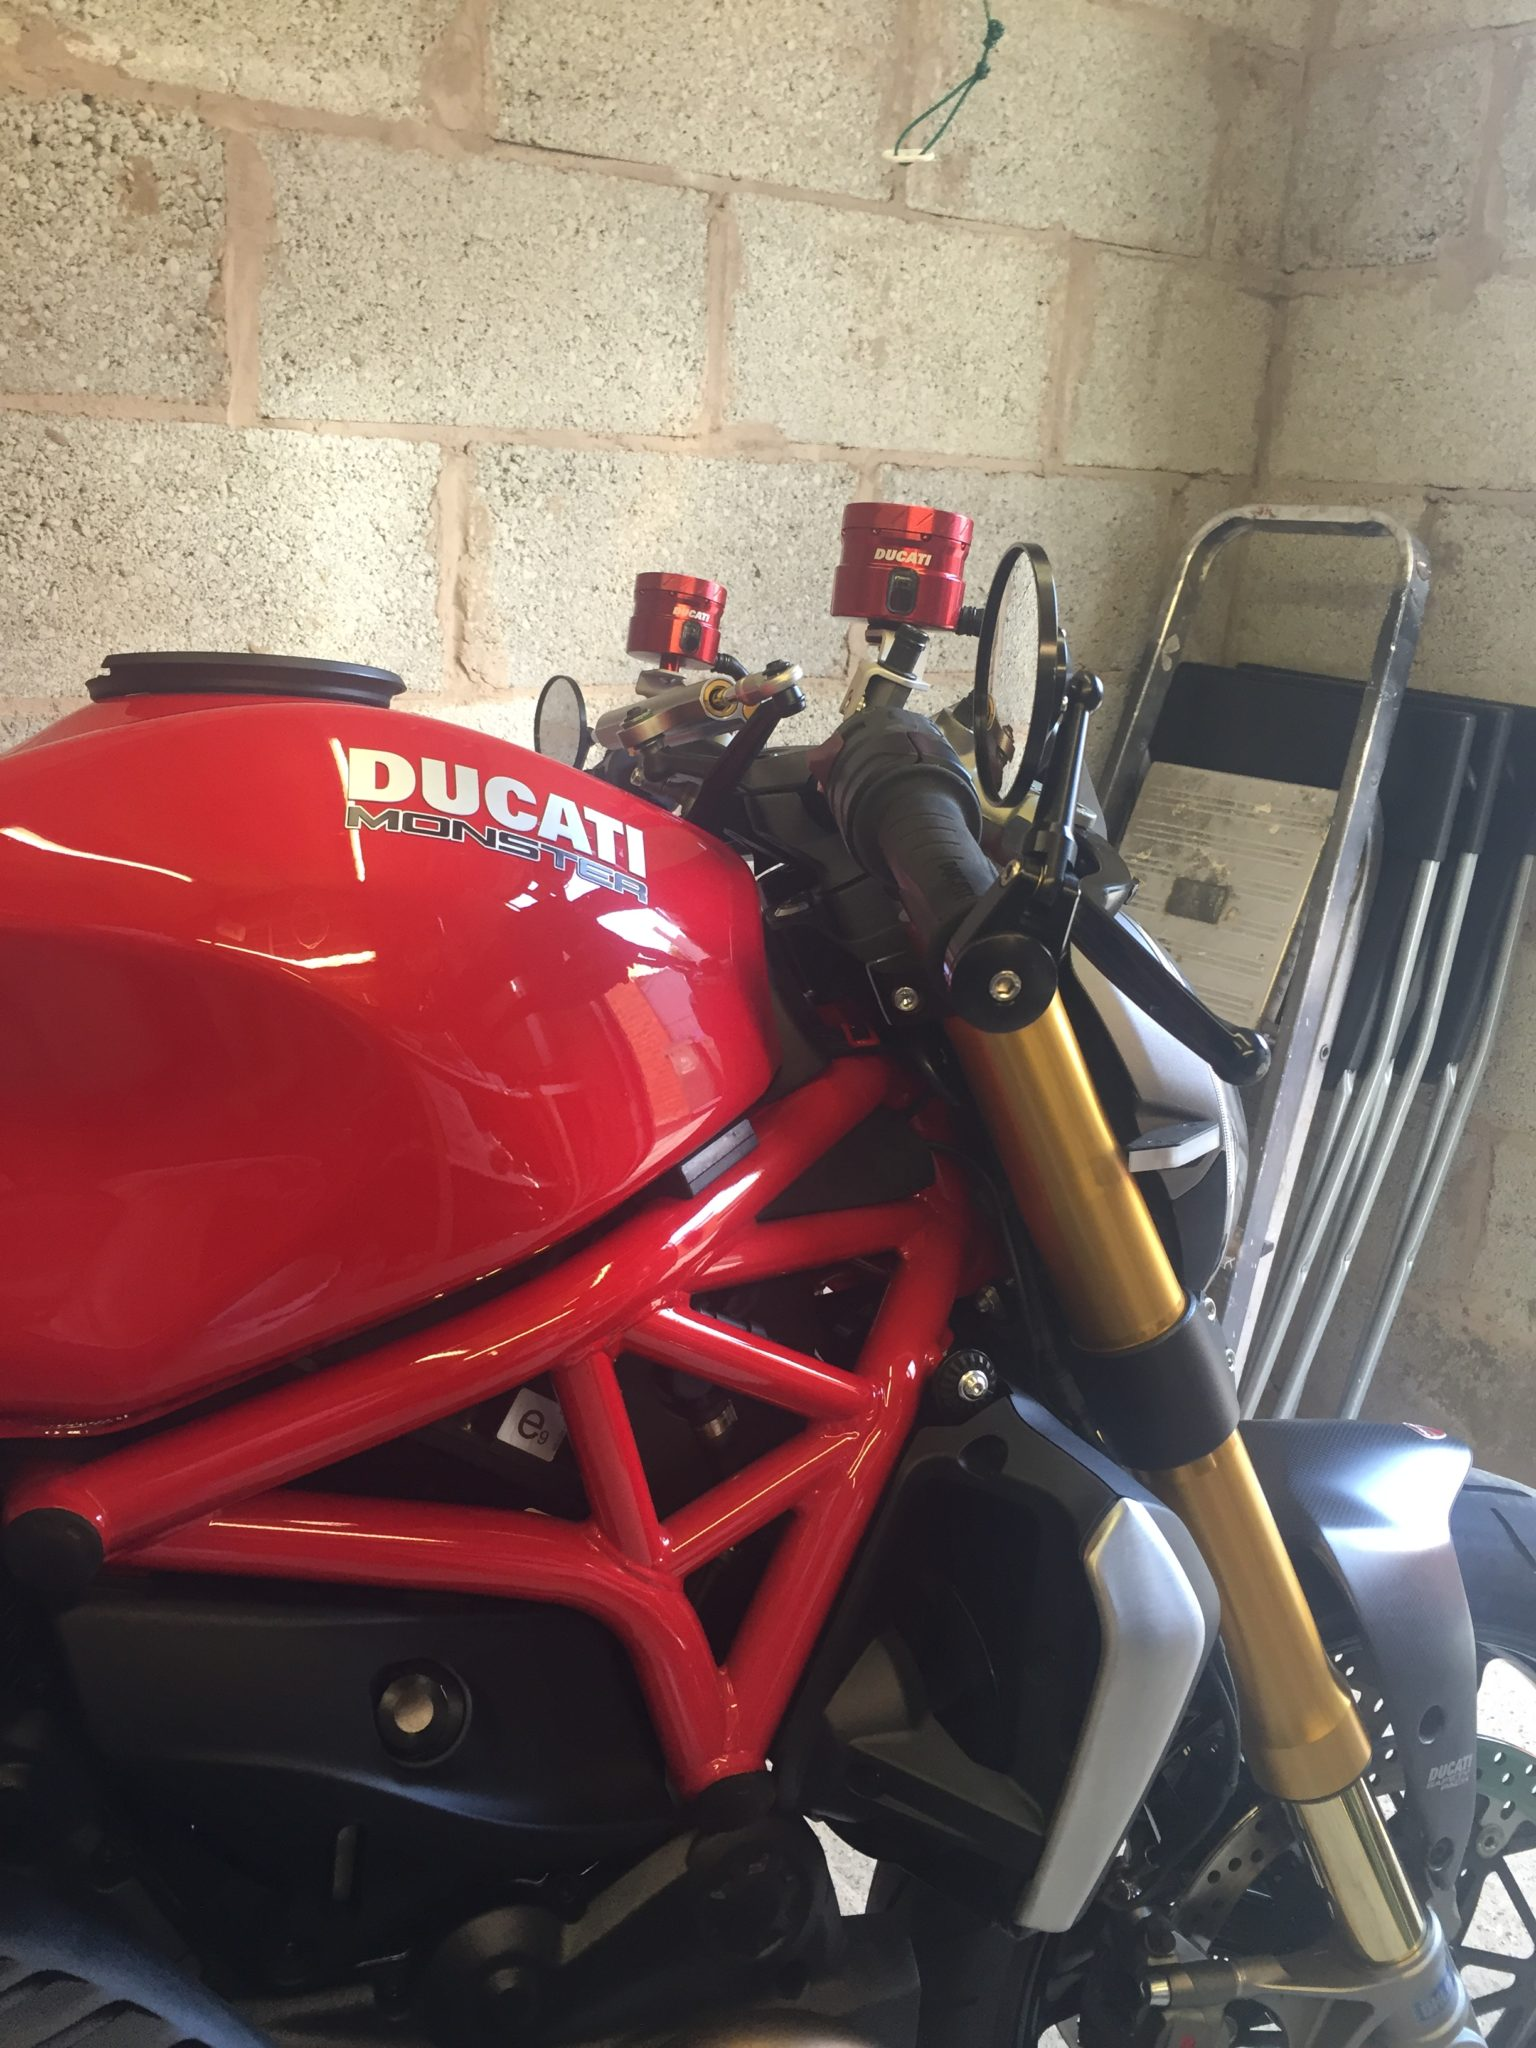 Remi – Ducati Monster 1200S